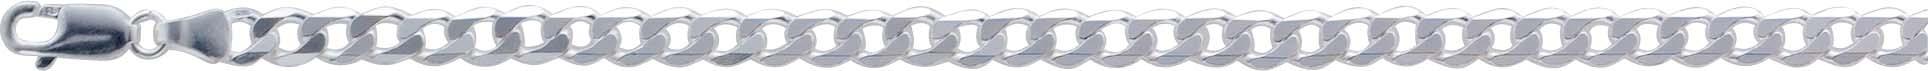 UNO A ERRE Panzerkette Panzerarmband Herrenkette Herrenarmband Silberkette 925 Halskette 925 5mm 60 256477160